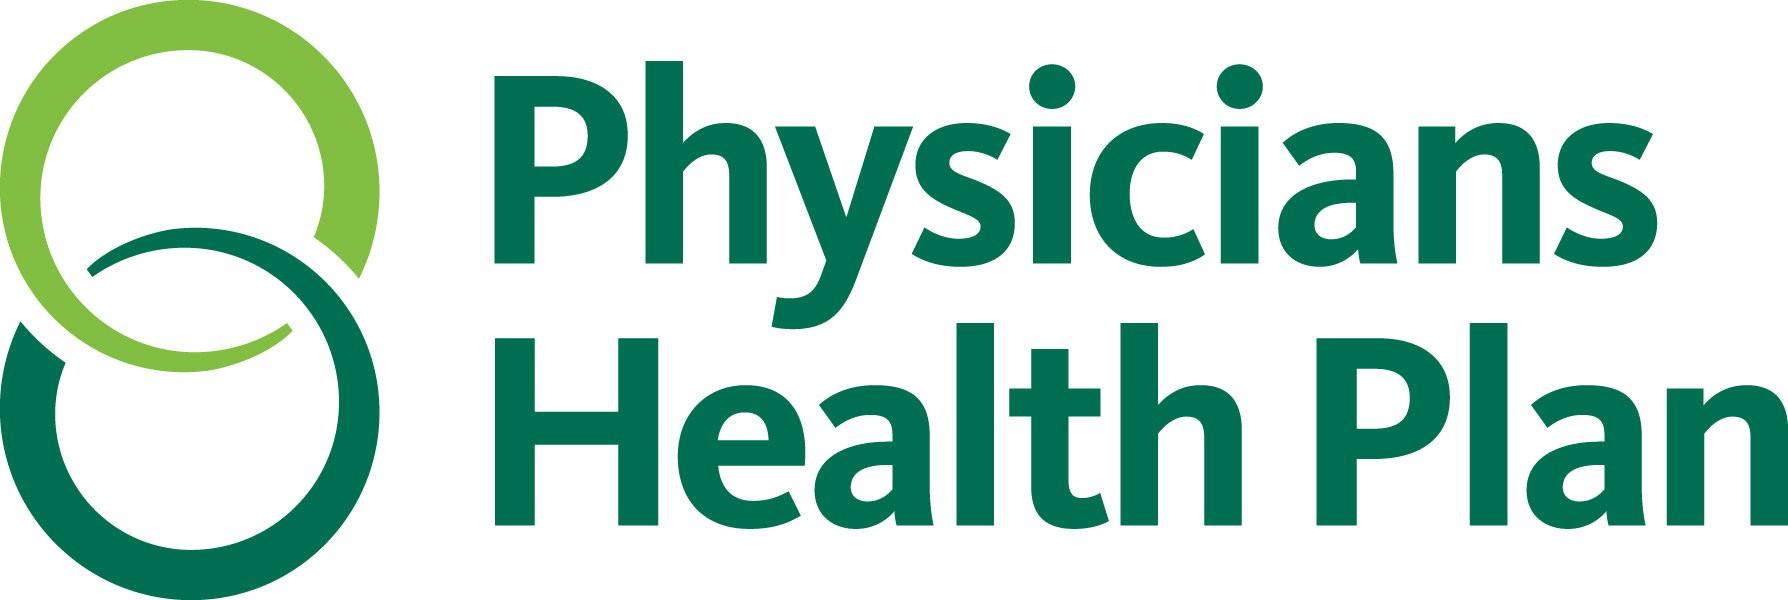 Mohawk Valley Health System logo